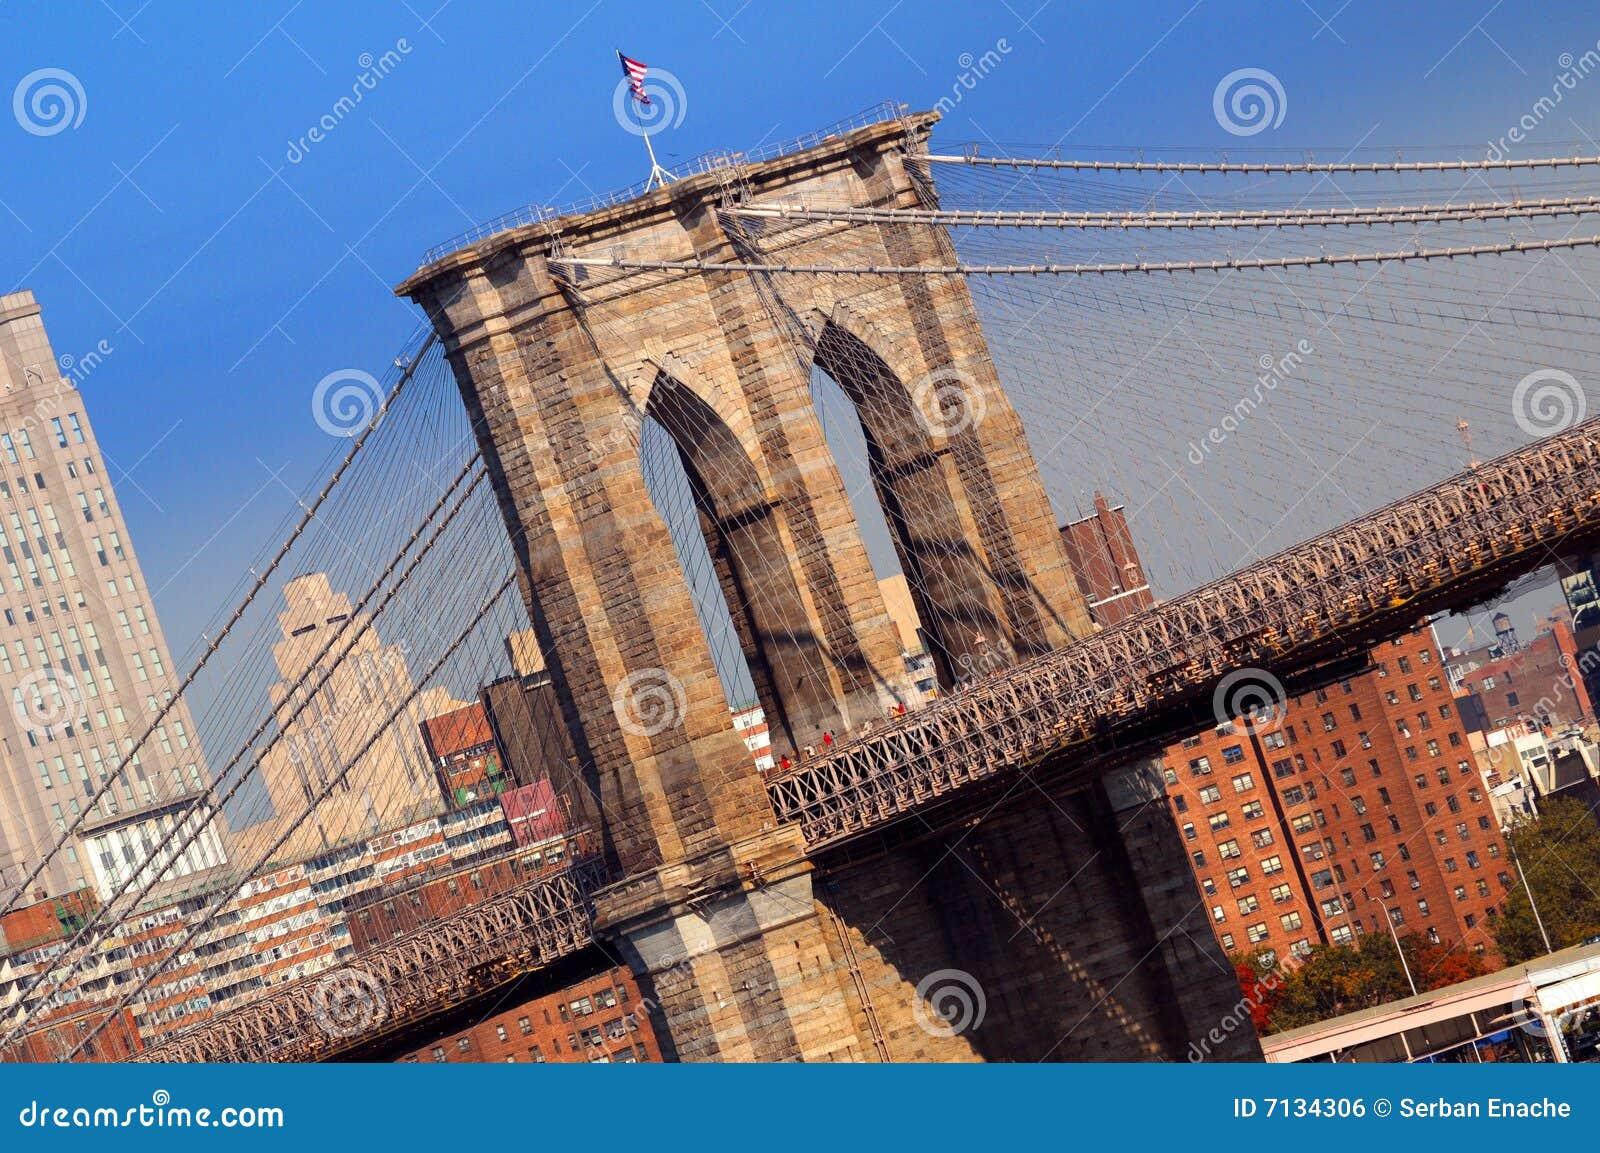 Brooklyn Bridge scenic